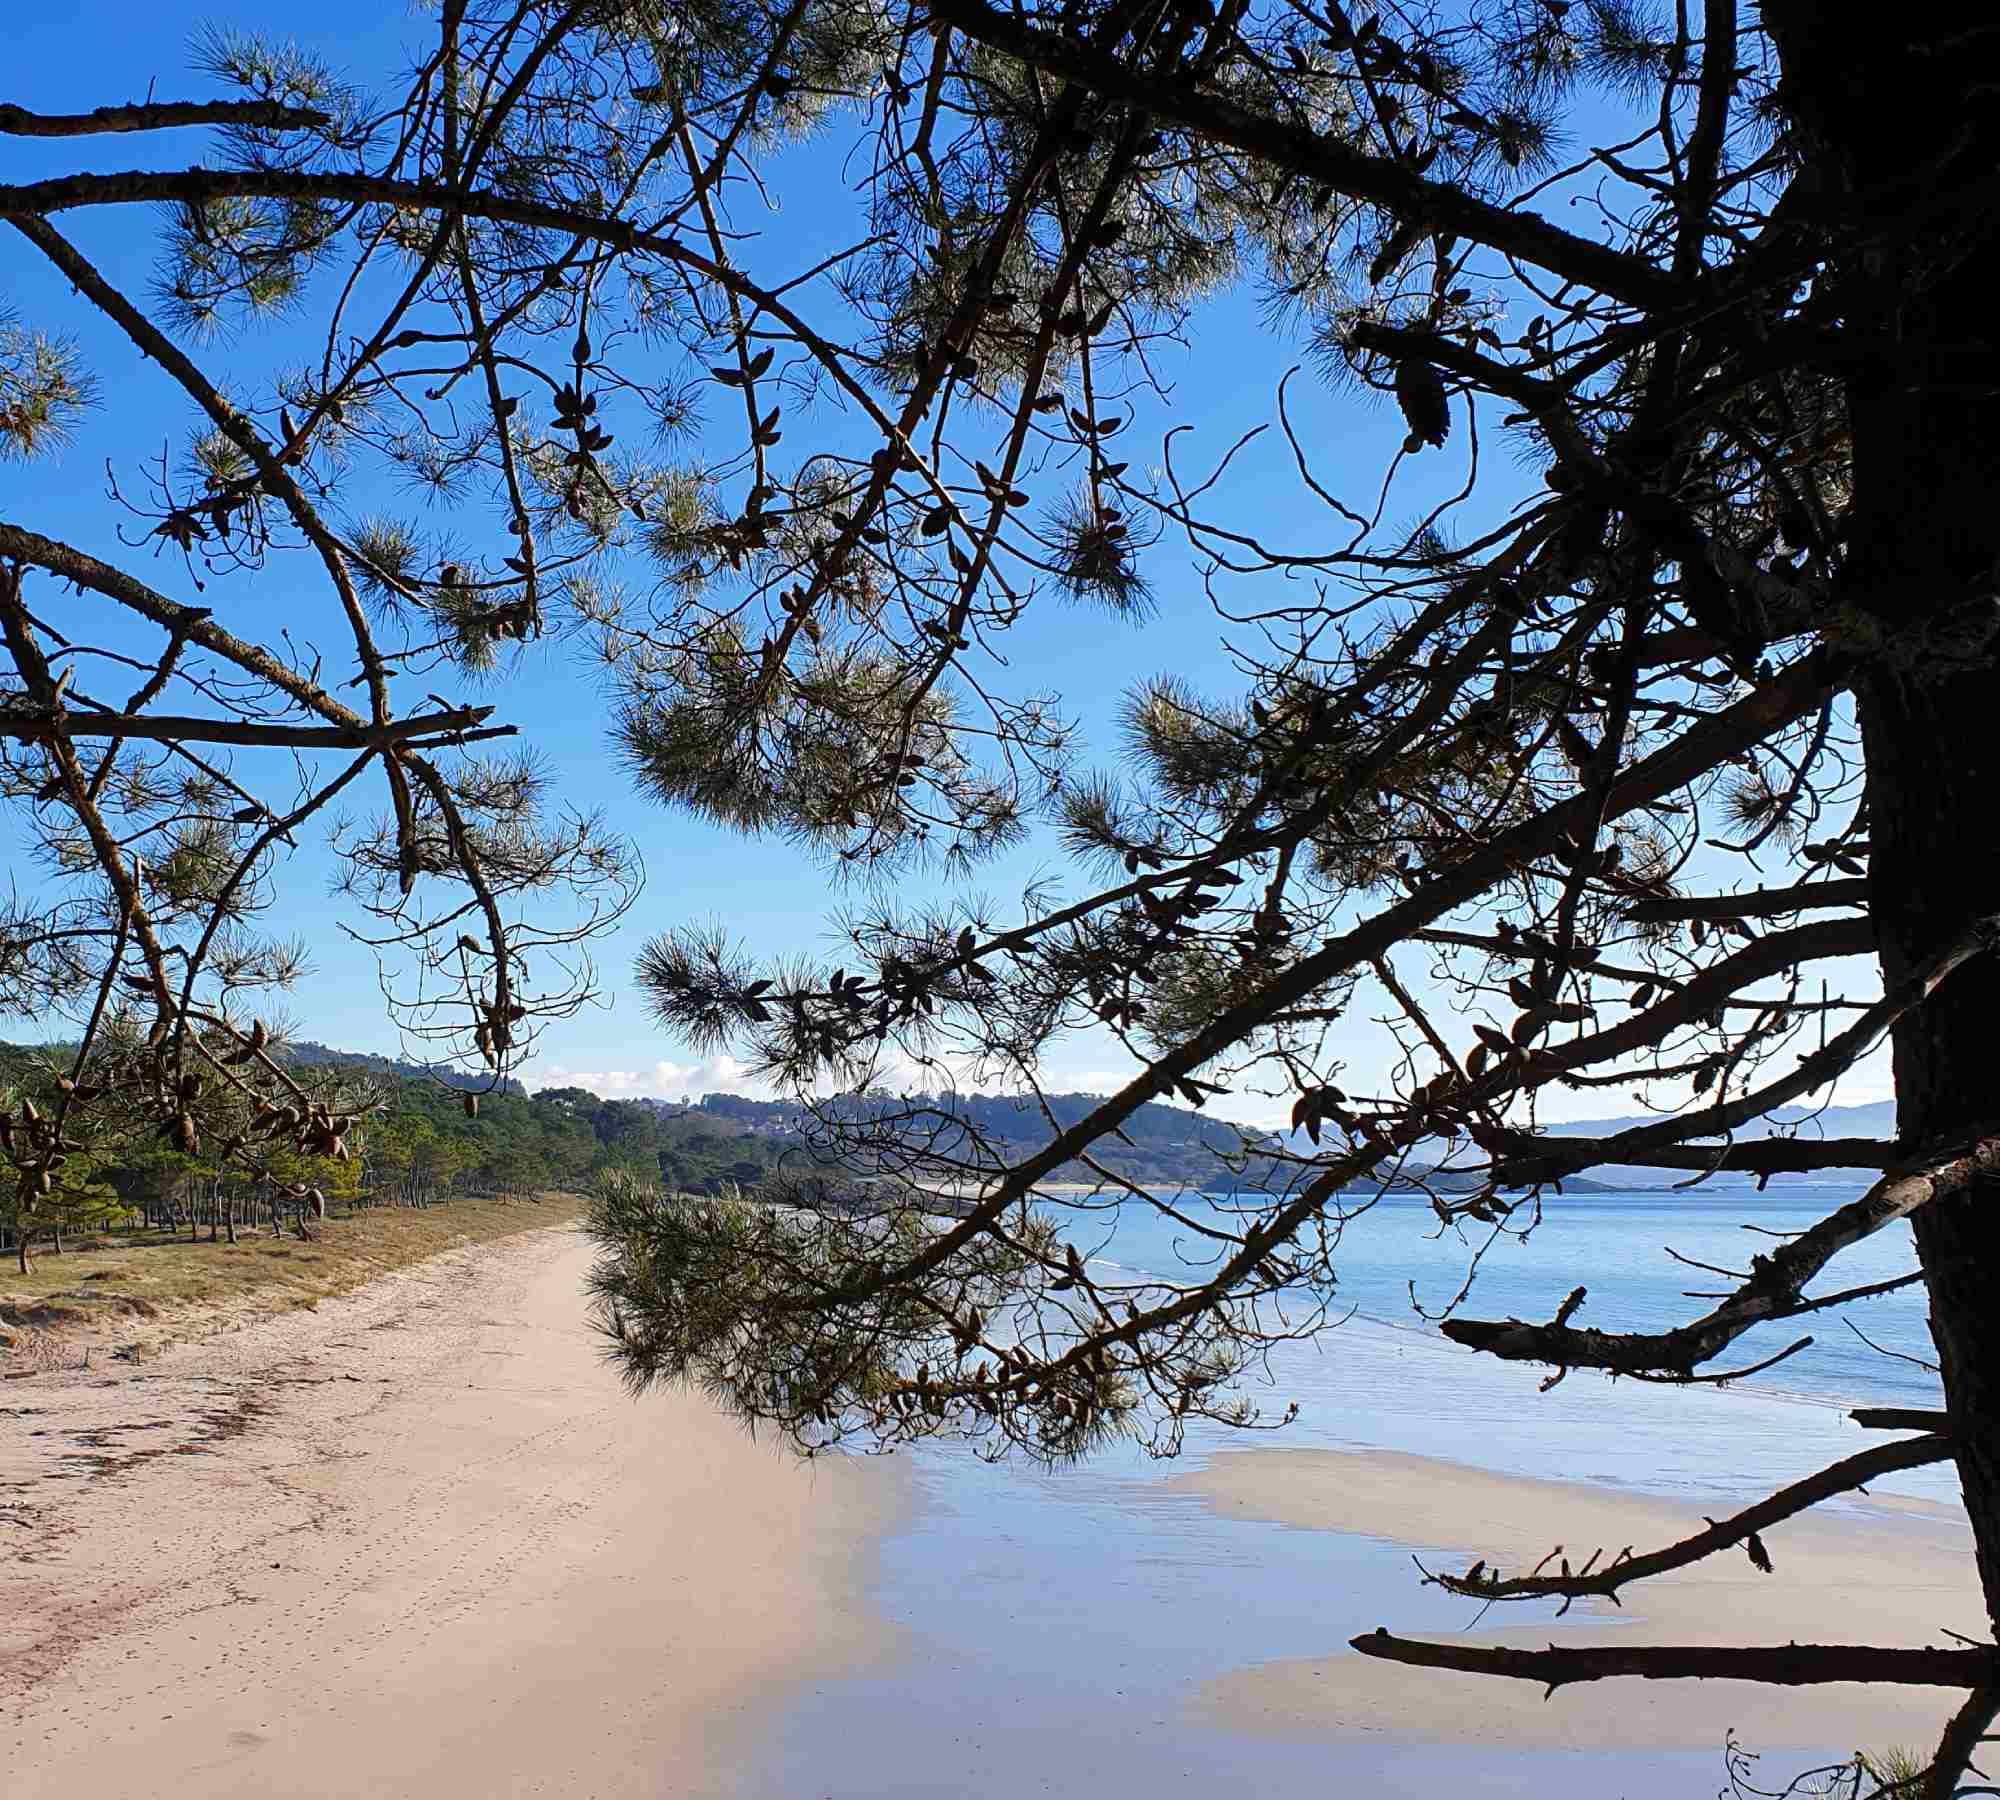 playa-pinos-costa